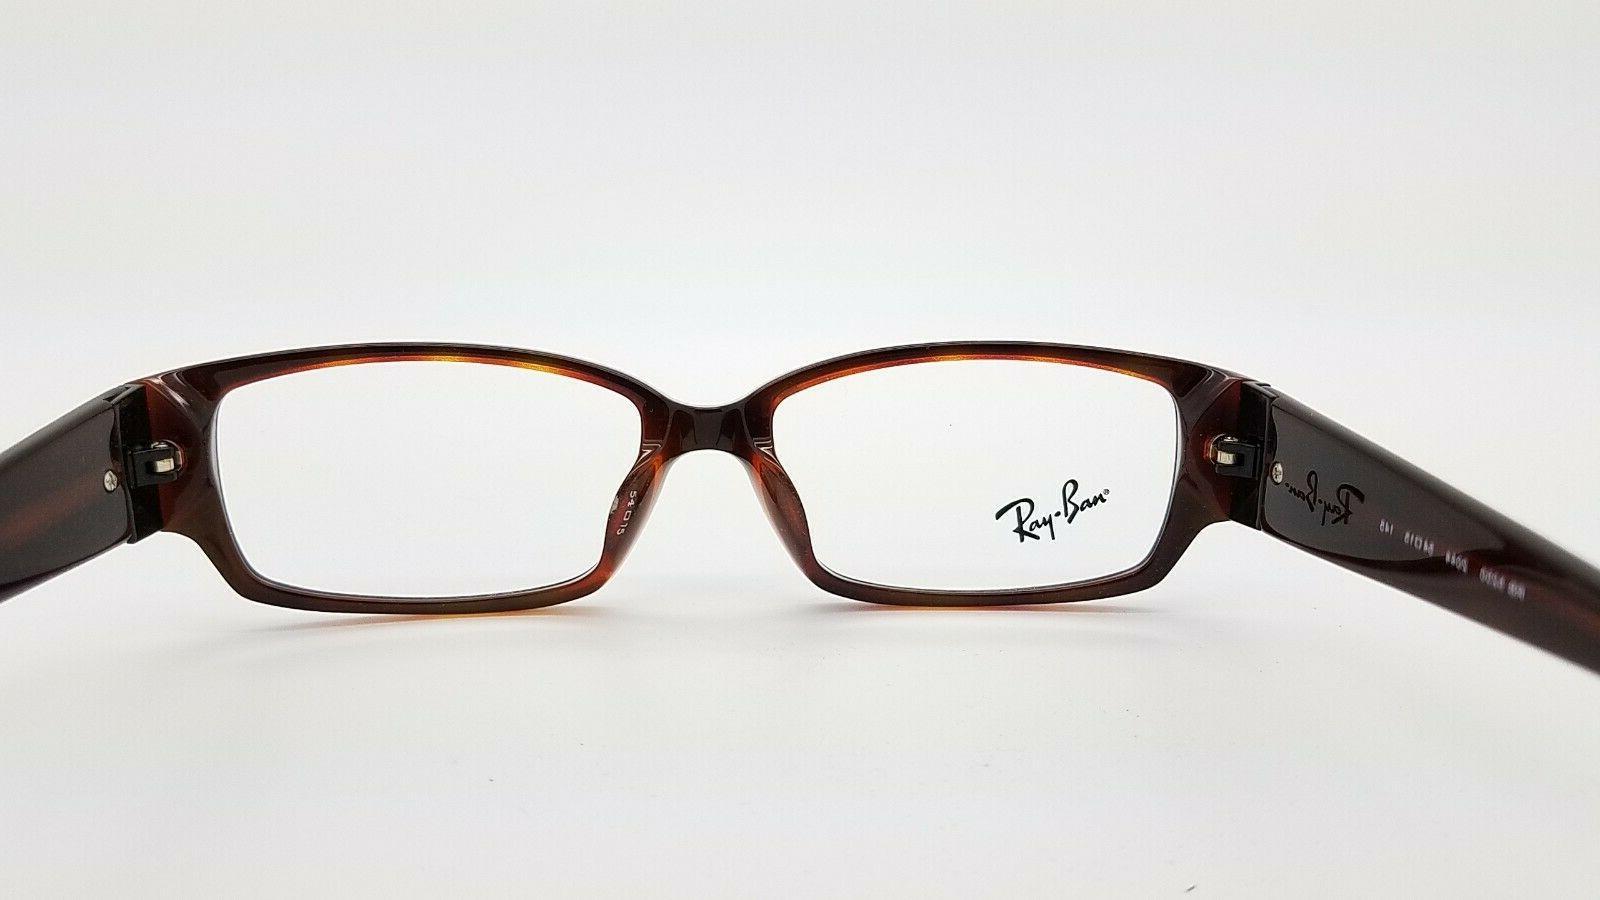 Ray-Ban RX5250 Active Lifestyle Eyeglasses 2044